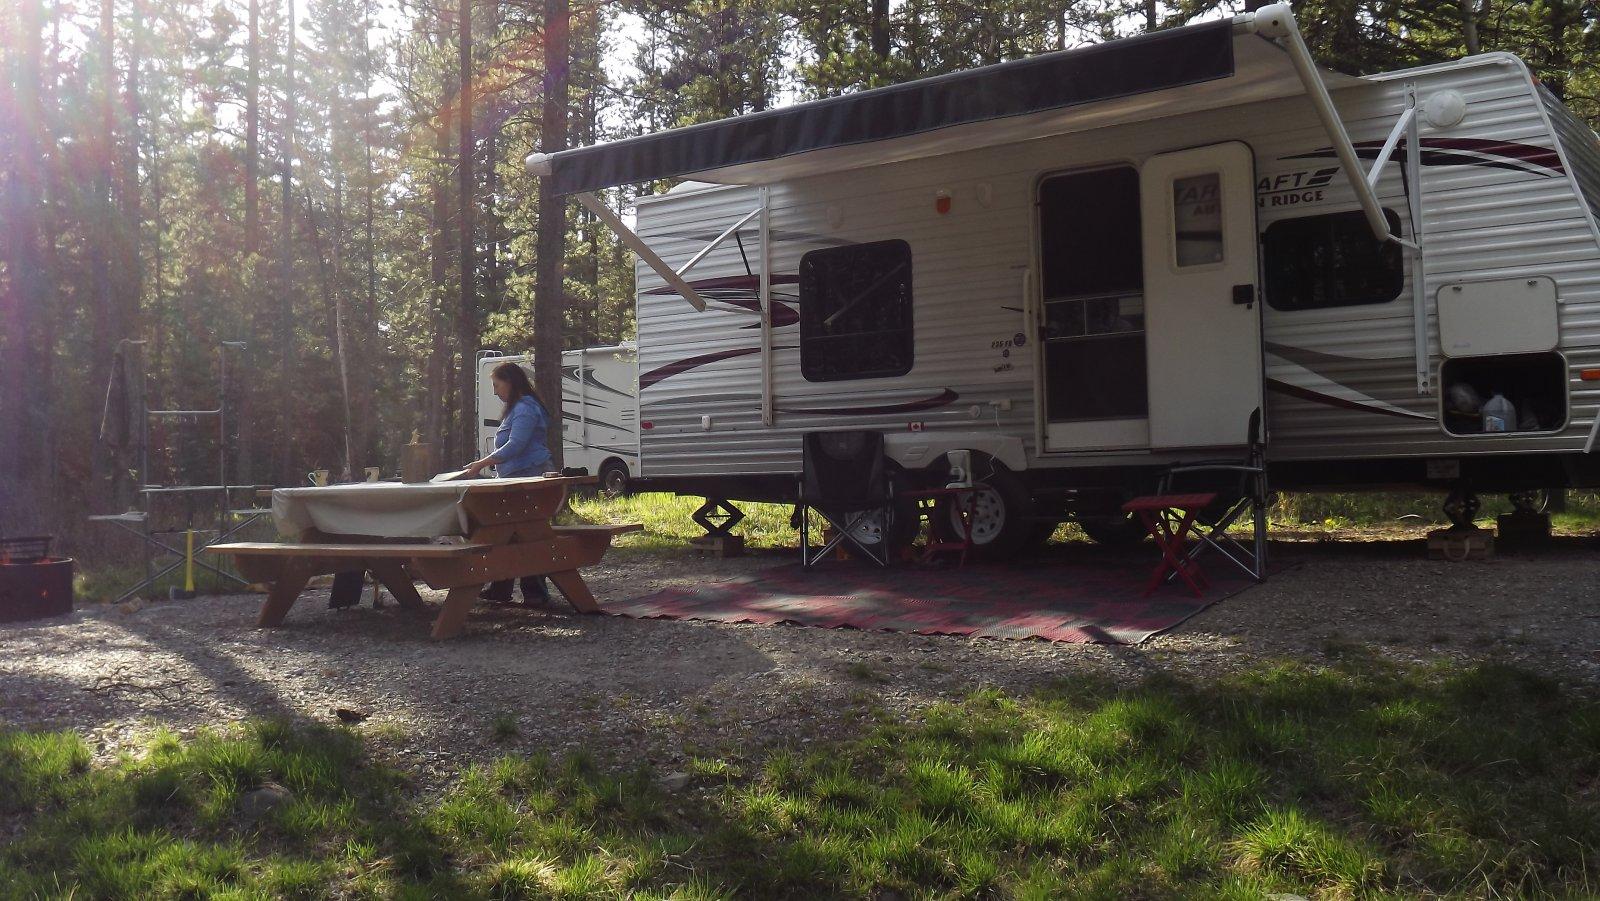 Click image for larger version  Name:Camping Sandy McNabb May 24 2015 071.jpg Views:245 Size:340.7 KB ID:99976